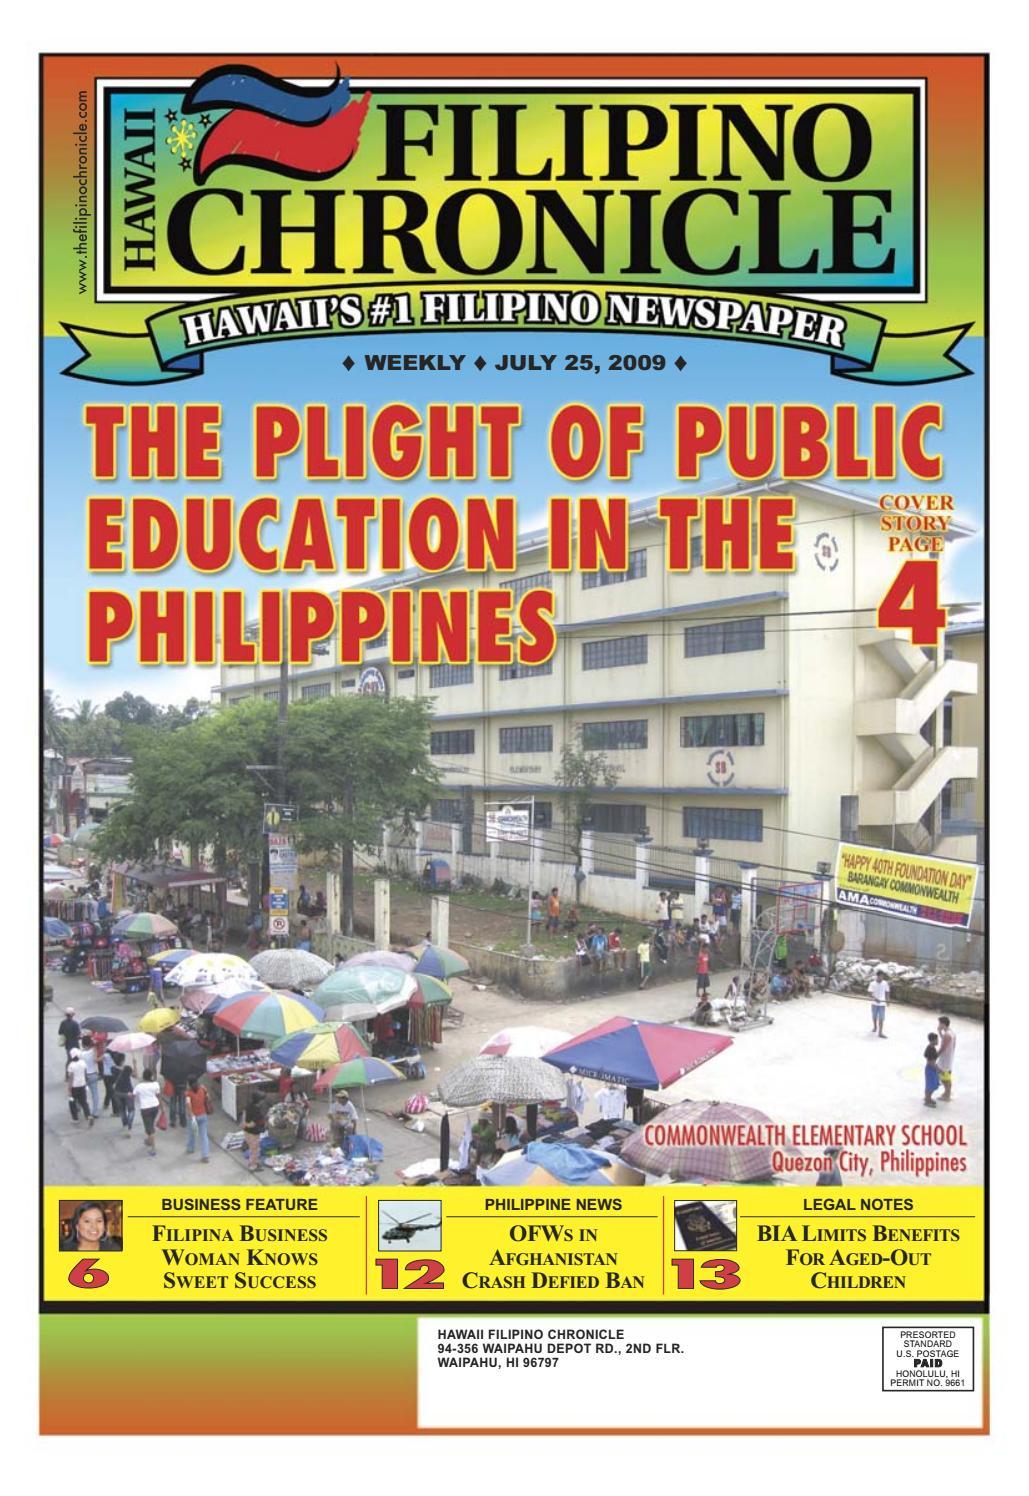 Download Video Adu Bagong : download, video, bagong, Hawaii, Filipino, Chronicle, Issuu